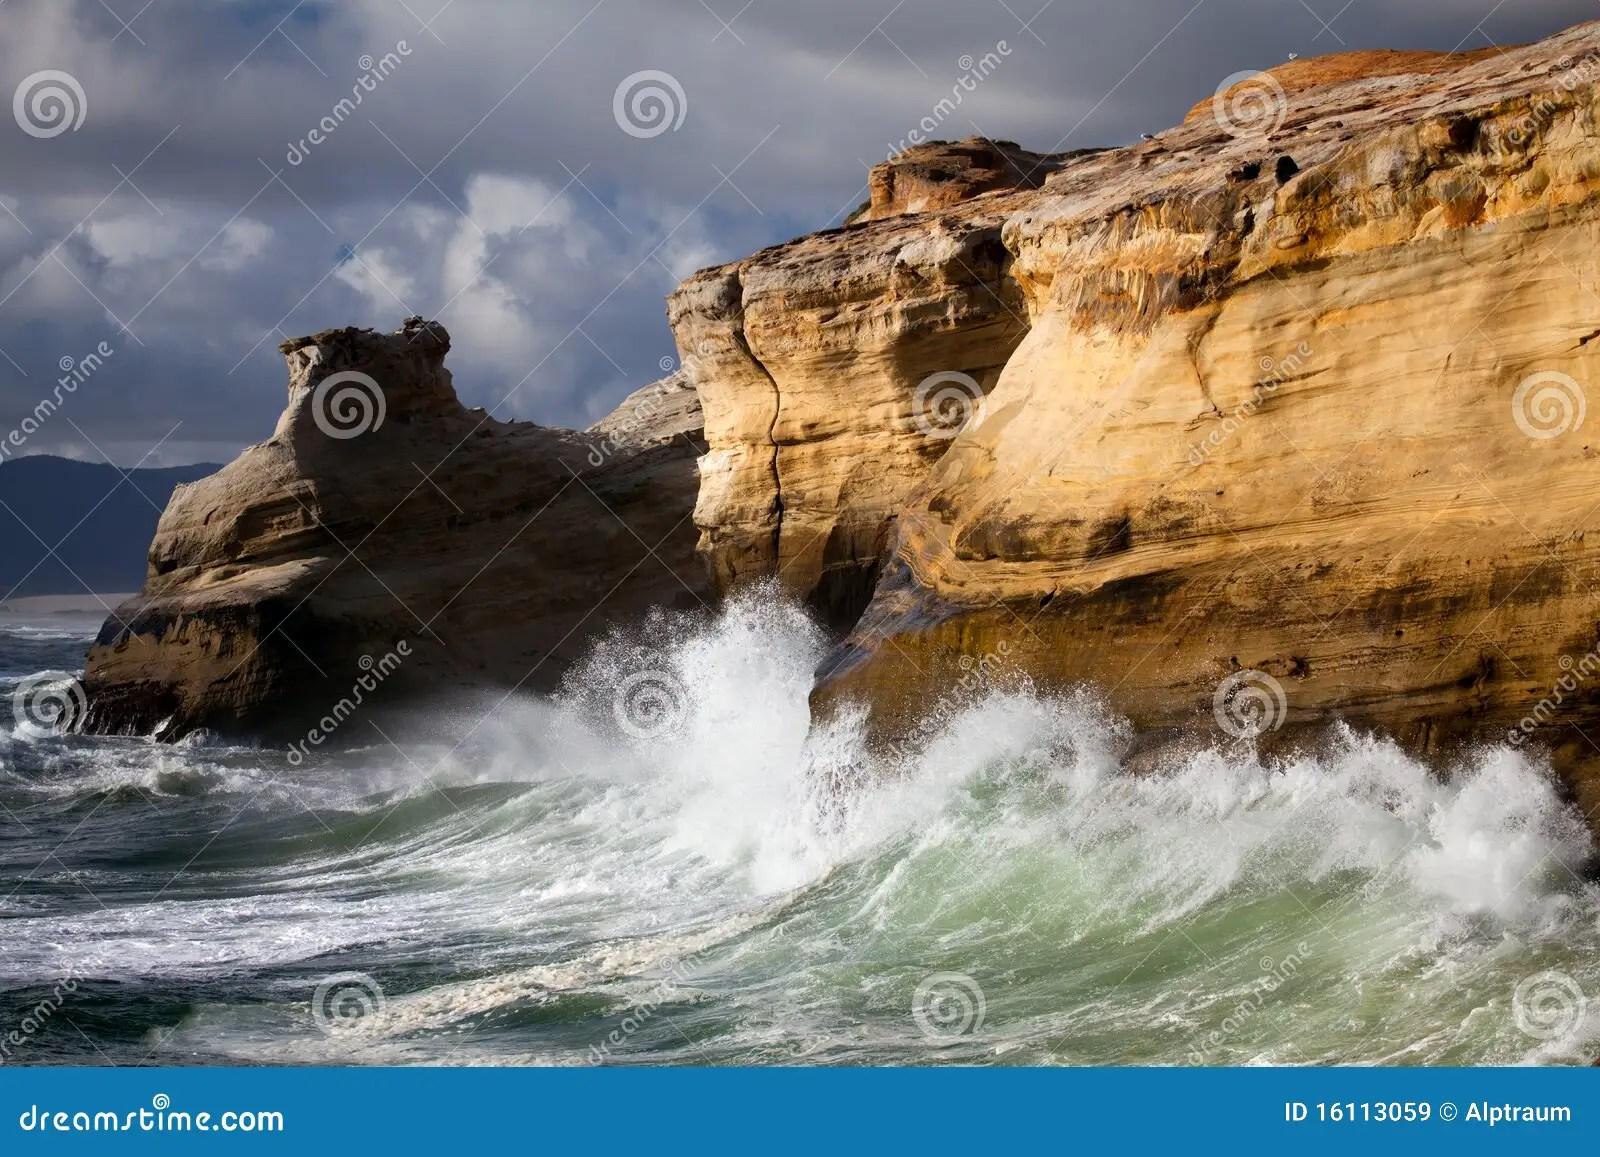 3d Wallpaper Ship Oregon Coast Landscape With Rough Seas Royalty Free Stock